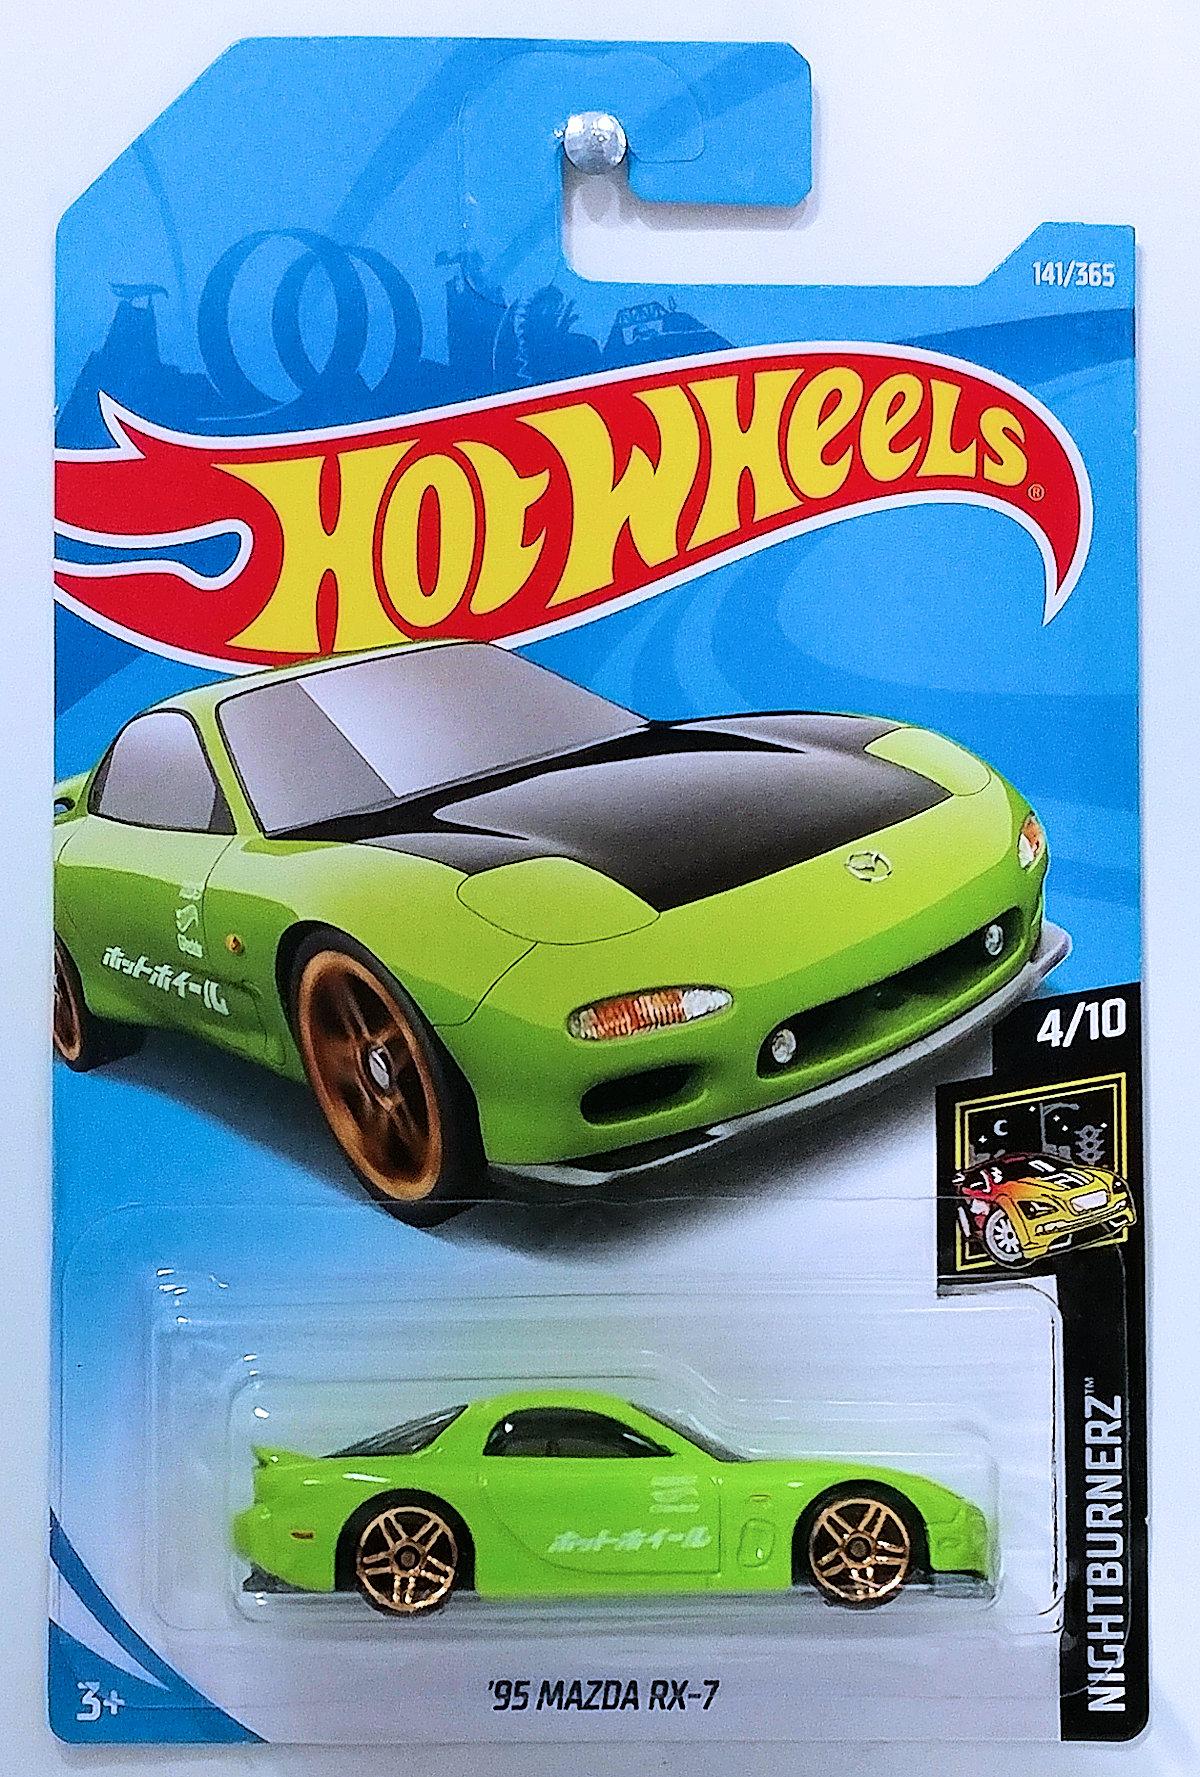 U002795 Mazda RX 7 | Model Cars | HobbyDB